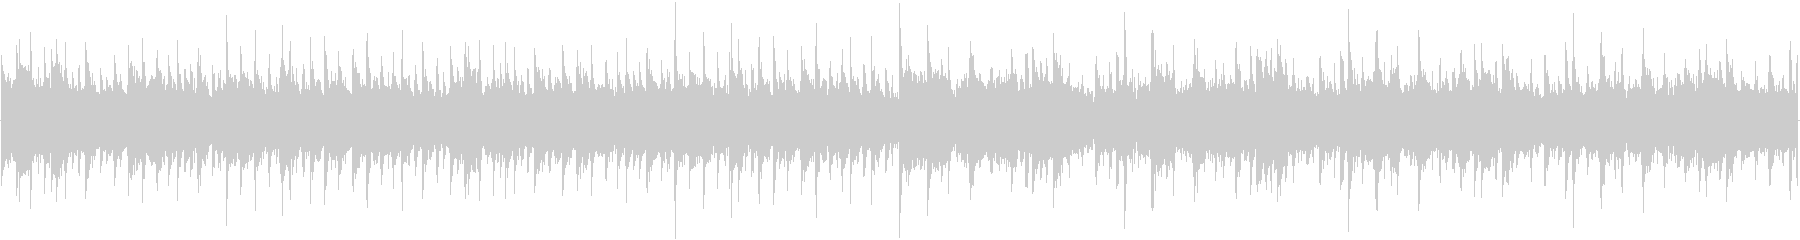 134bpm、E-Maj、16ビート(円の未再生の波形